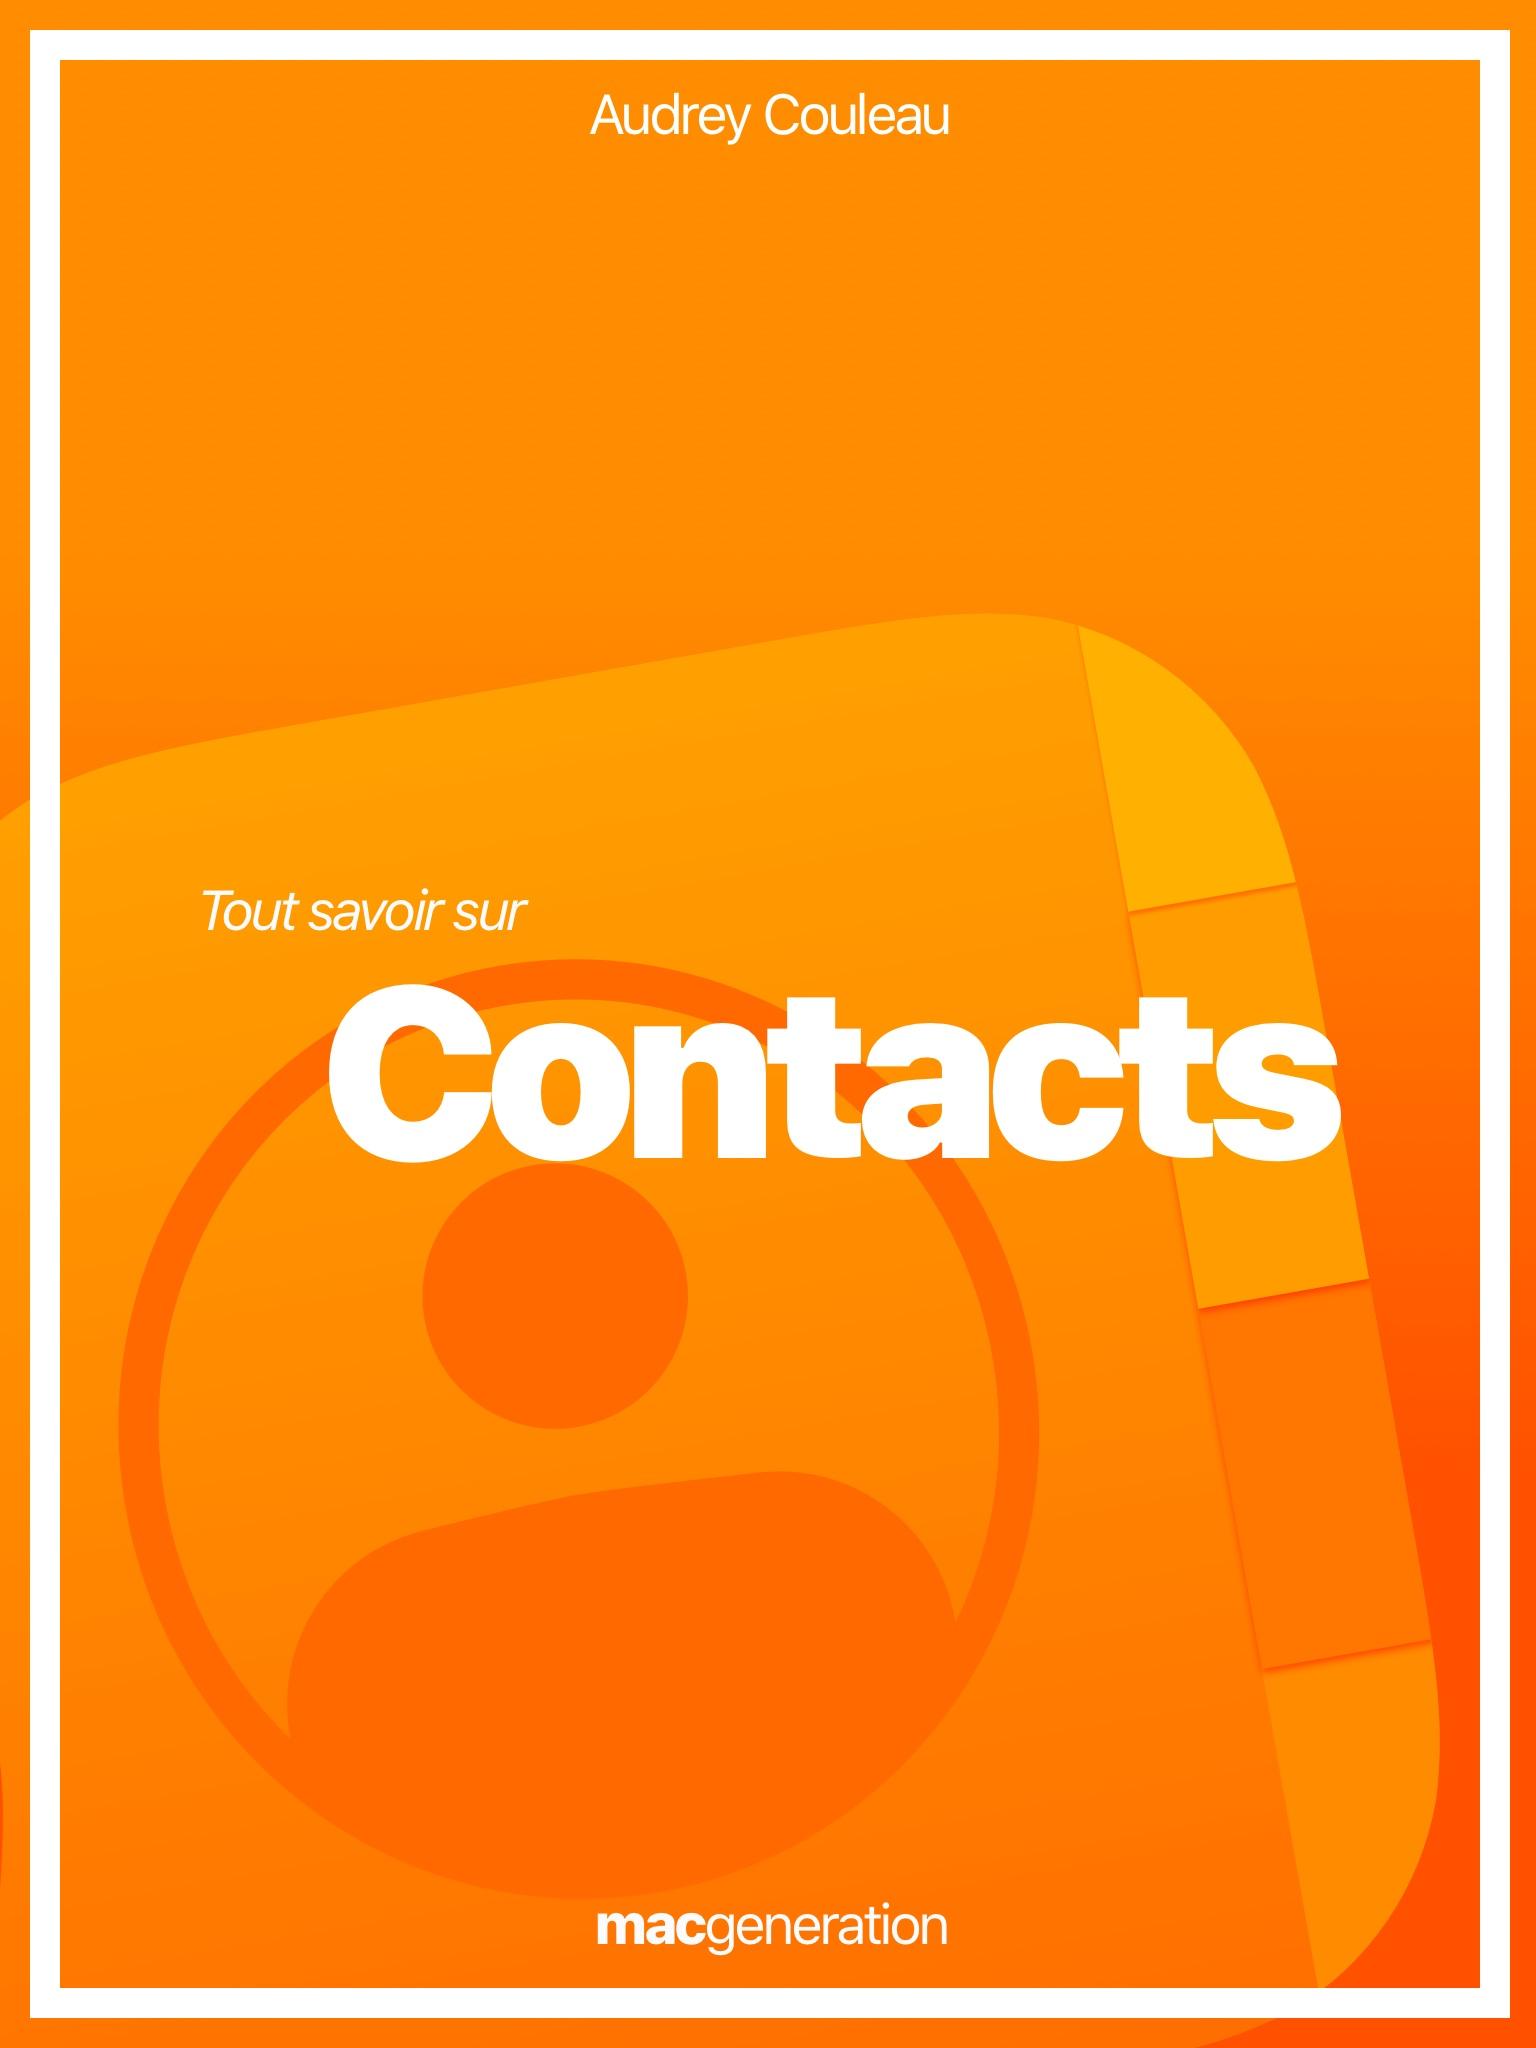 livres/savoir-contacts.jpg